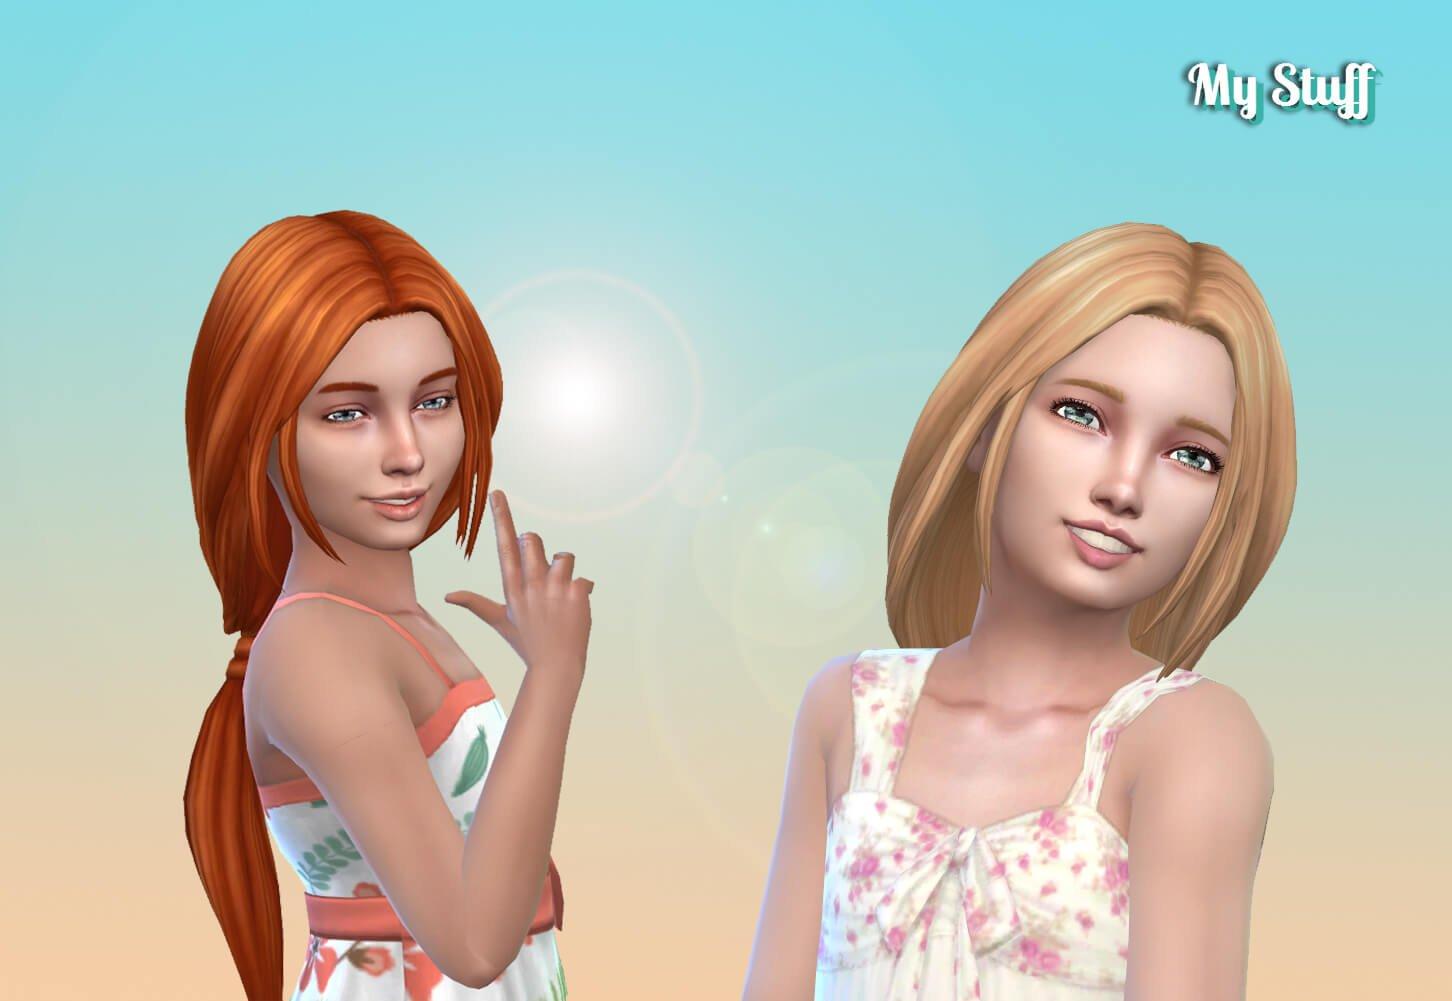 Telma Hairstyle for Girls